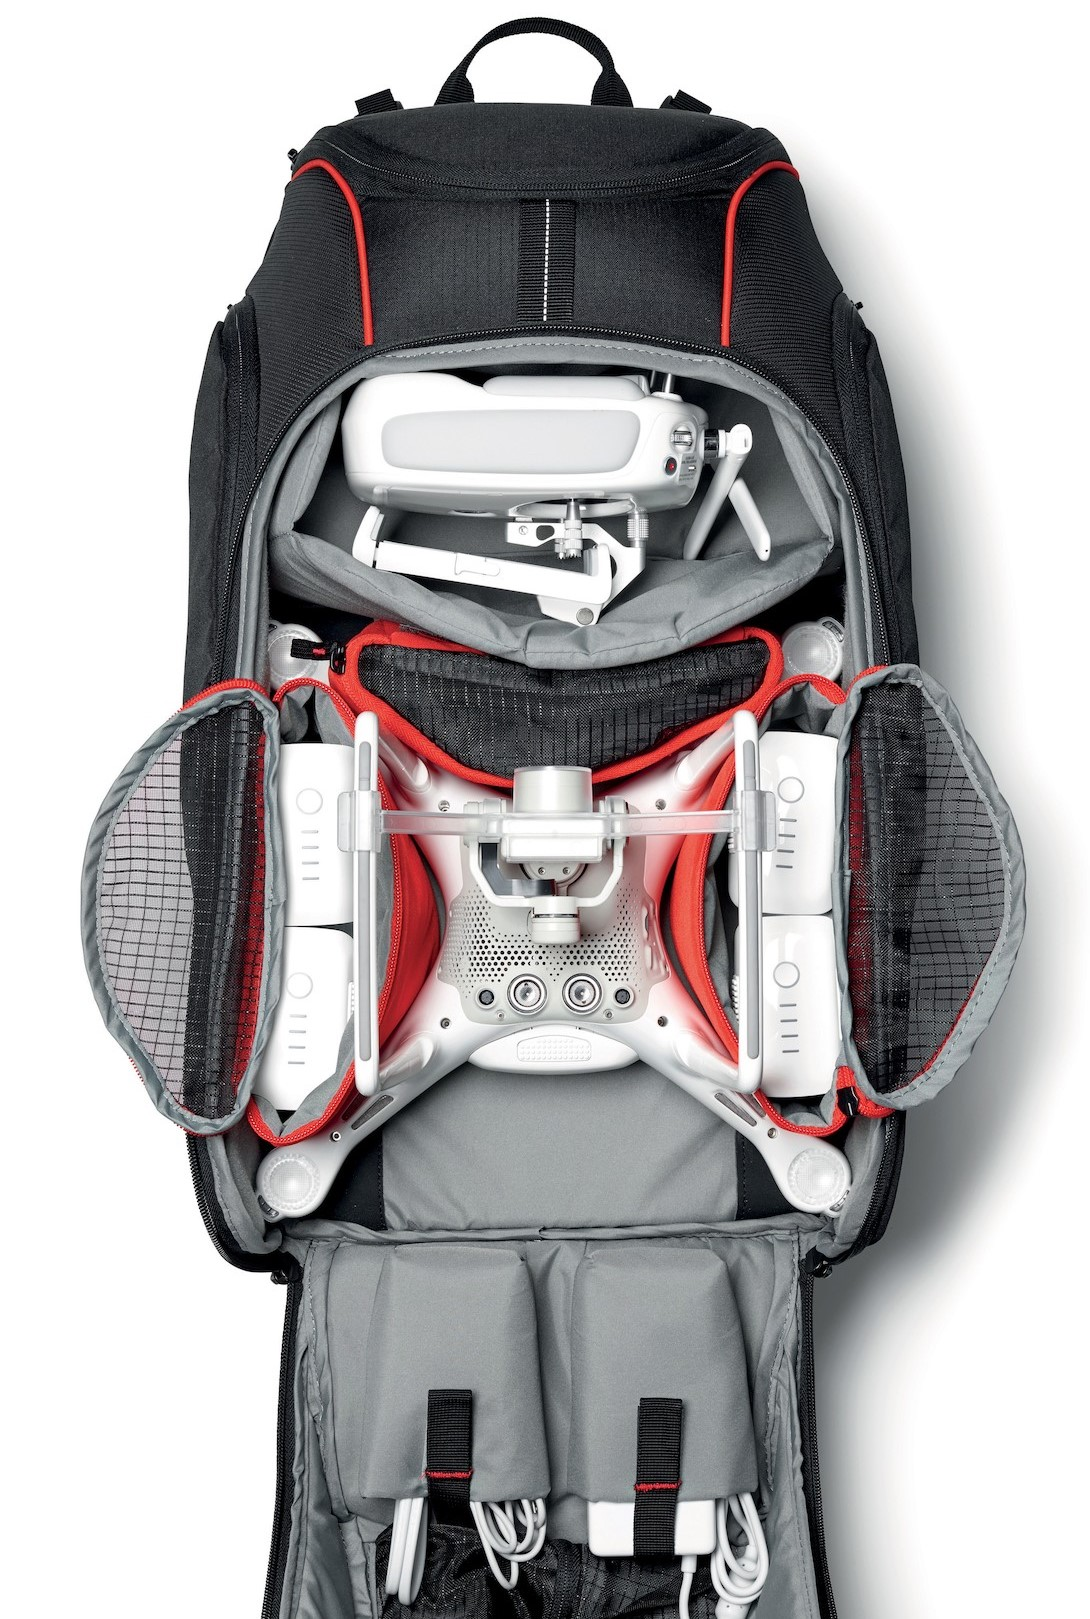 e0ebd7b1e246 Рюкзак для квадрокоптера MANFROTTO Aviator D1 Drone Backpack (MB BP-D1)